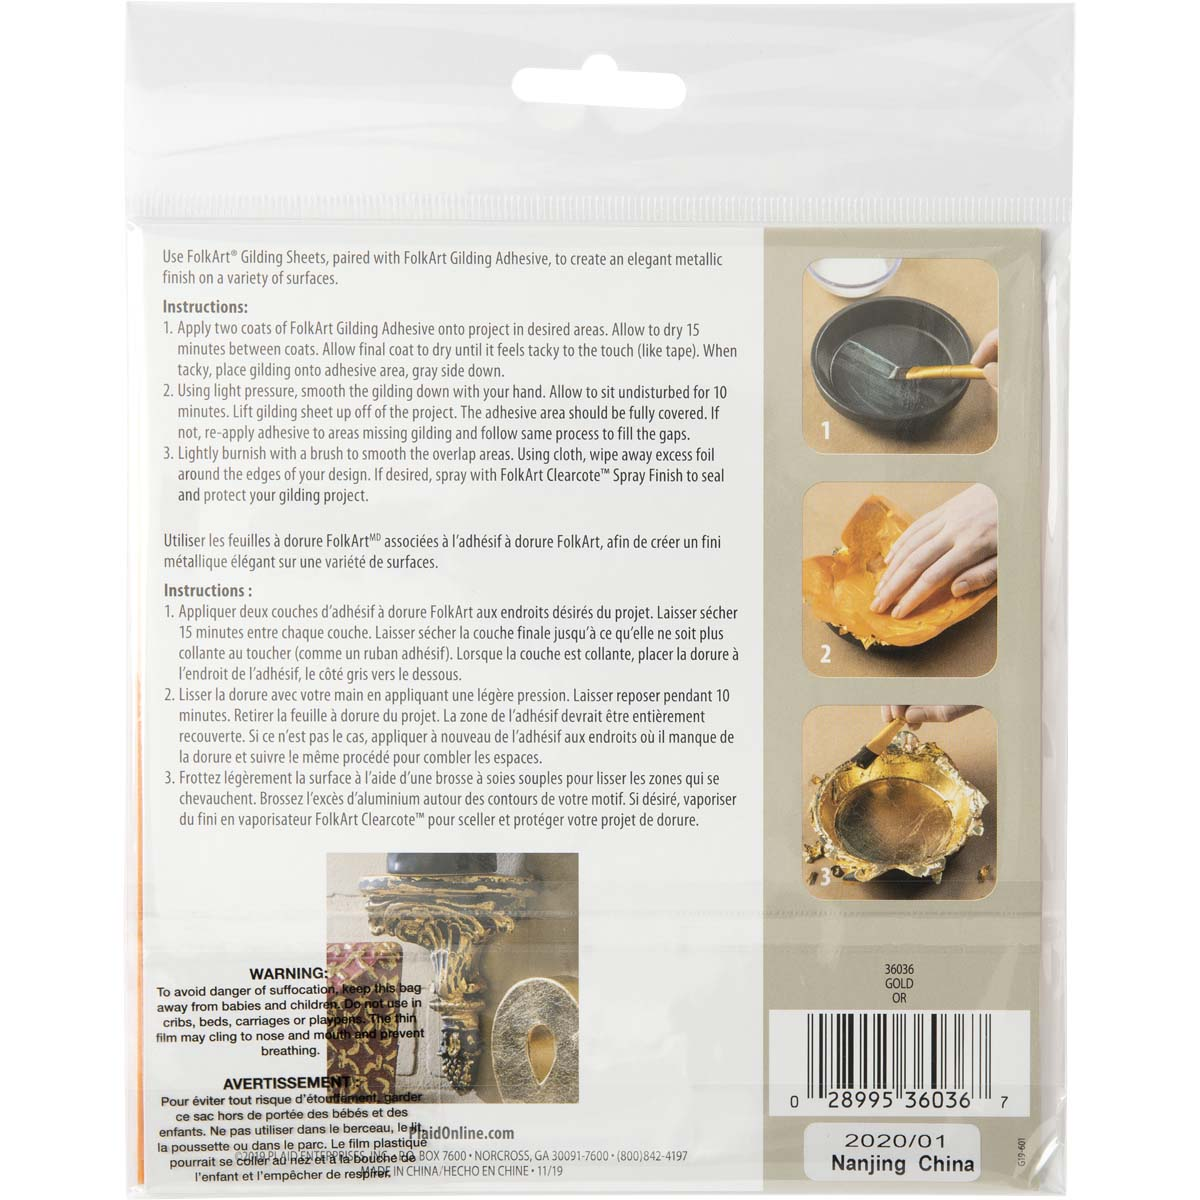 FolkArt ® Gilding Sheets - Gold, 12 pc. - 36036